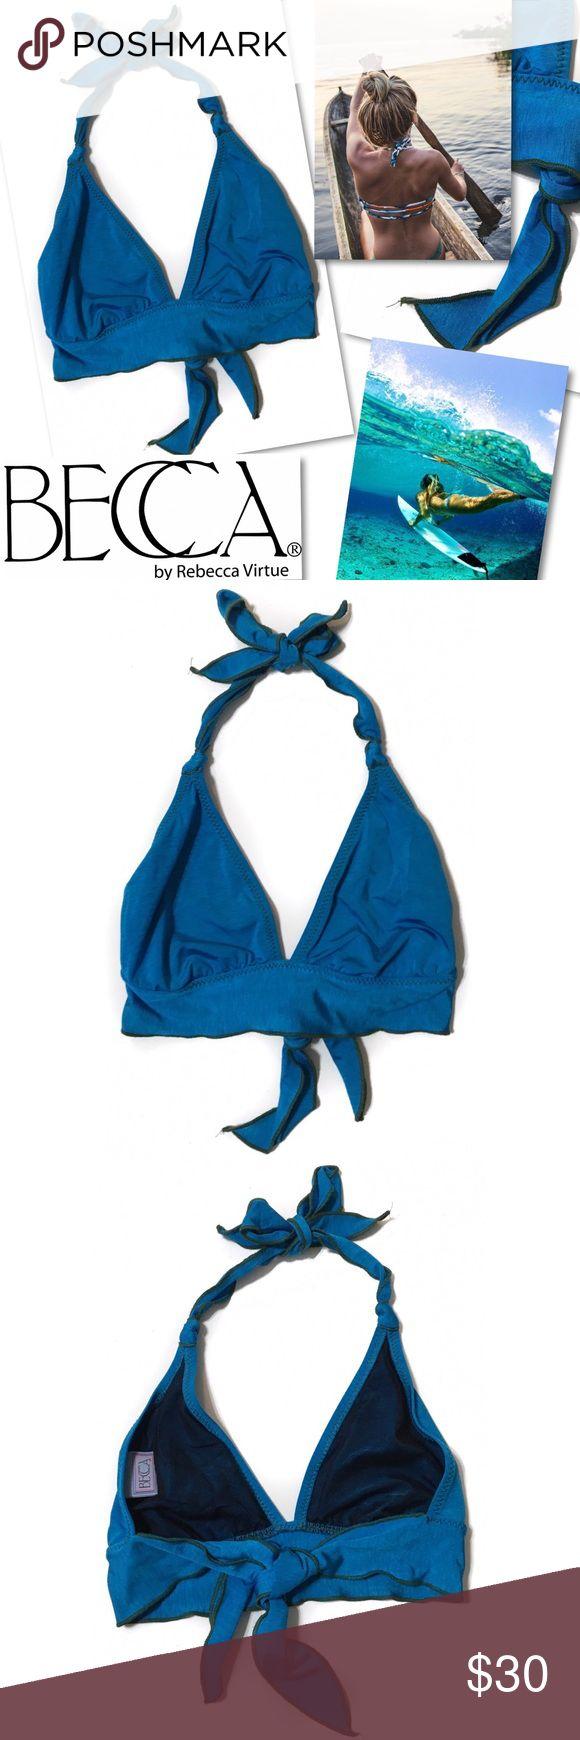 BECCA BLUE WIDE BAND SWIMSUIT HALTER BIKINI TOP BECCA  BLUE WIDE BAND SWIMSUIT HALTER BIKINI TOP  SZ D / DD  RETAILS $58 BECCA Swim Bikinis